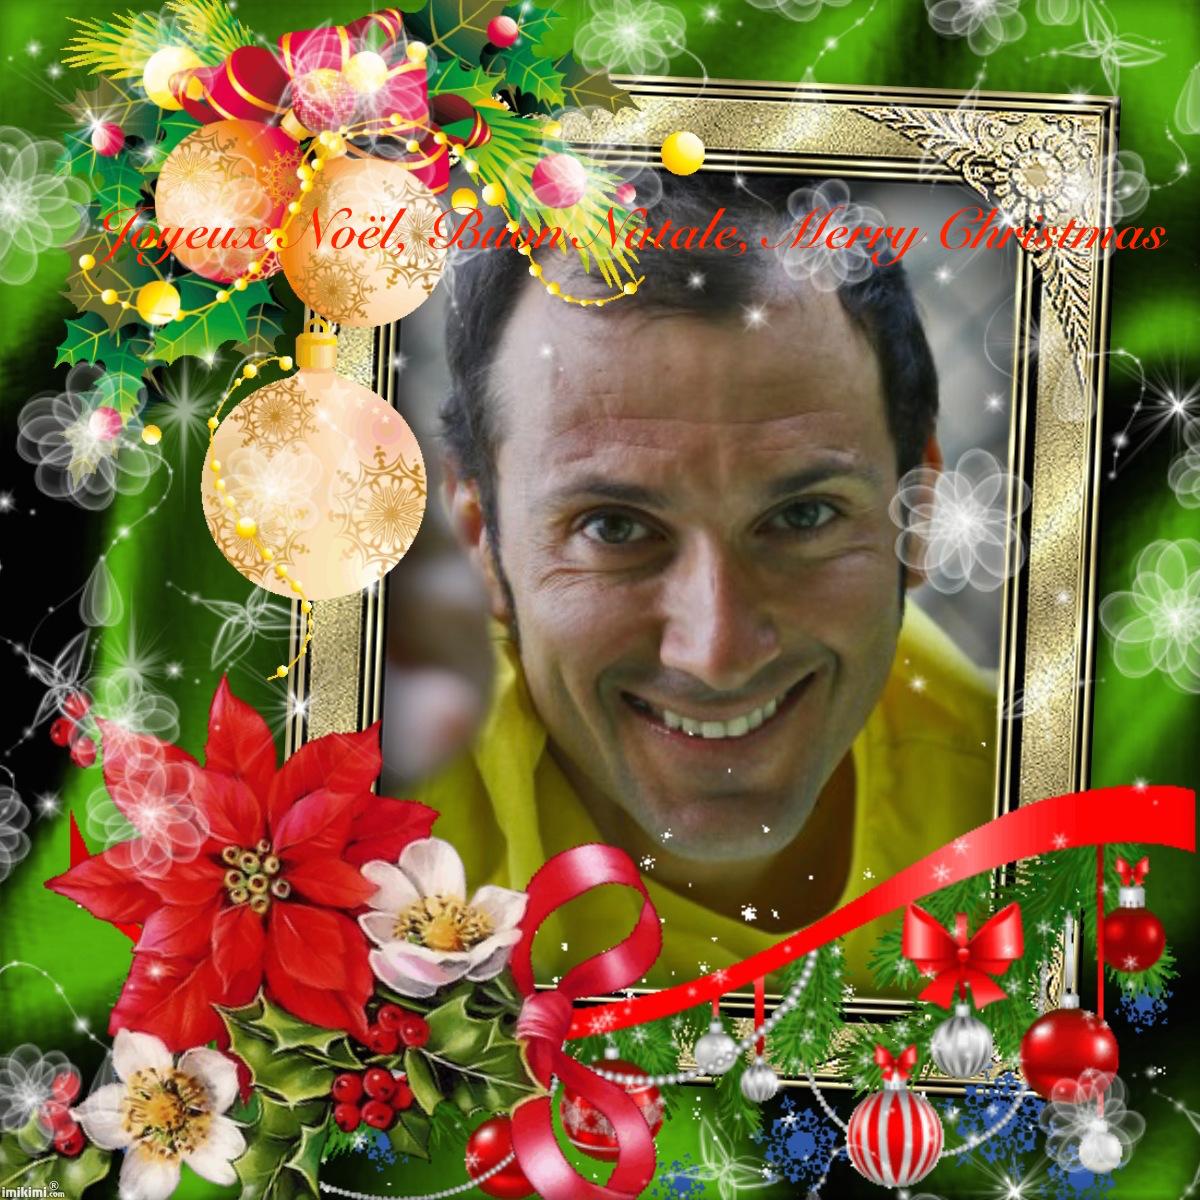 https://static.blog4ever.com/2014/01/760959/Merry-Christmas---1By4u-11S---print.jpg